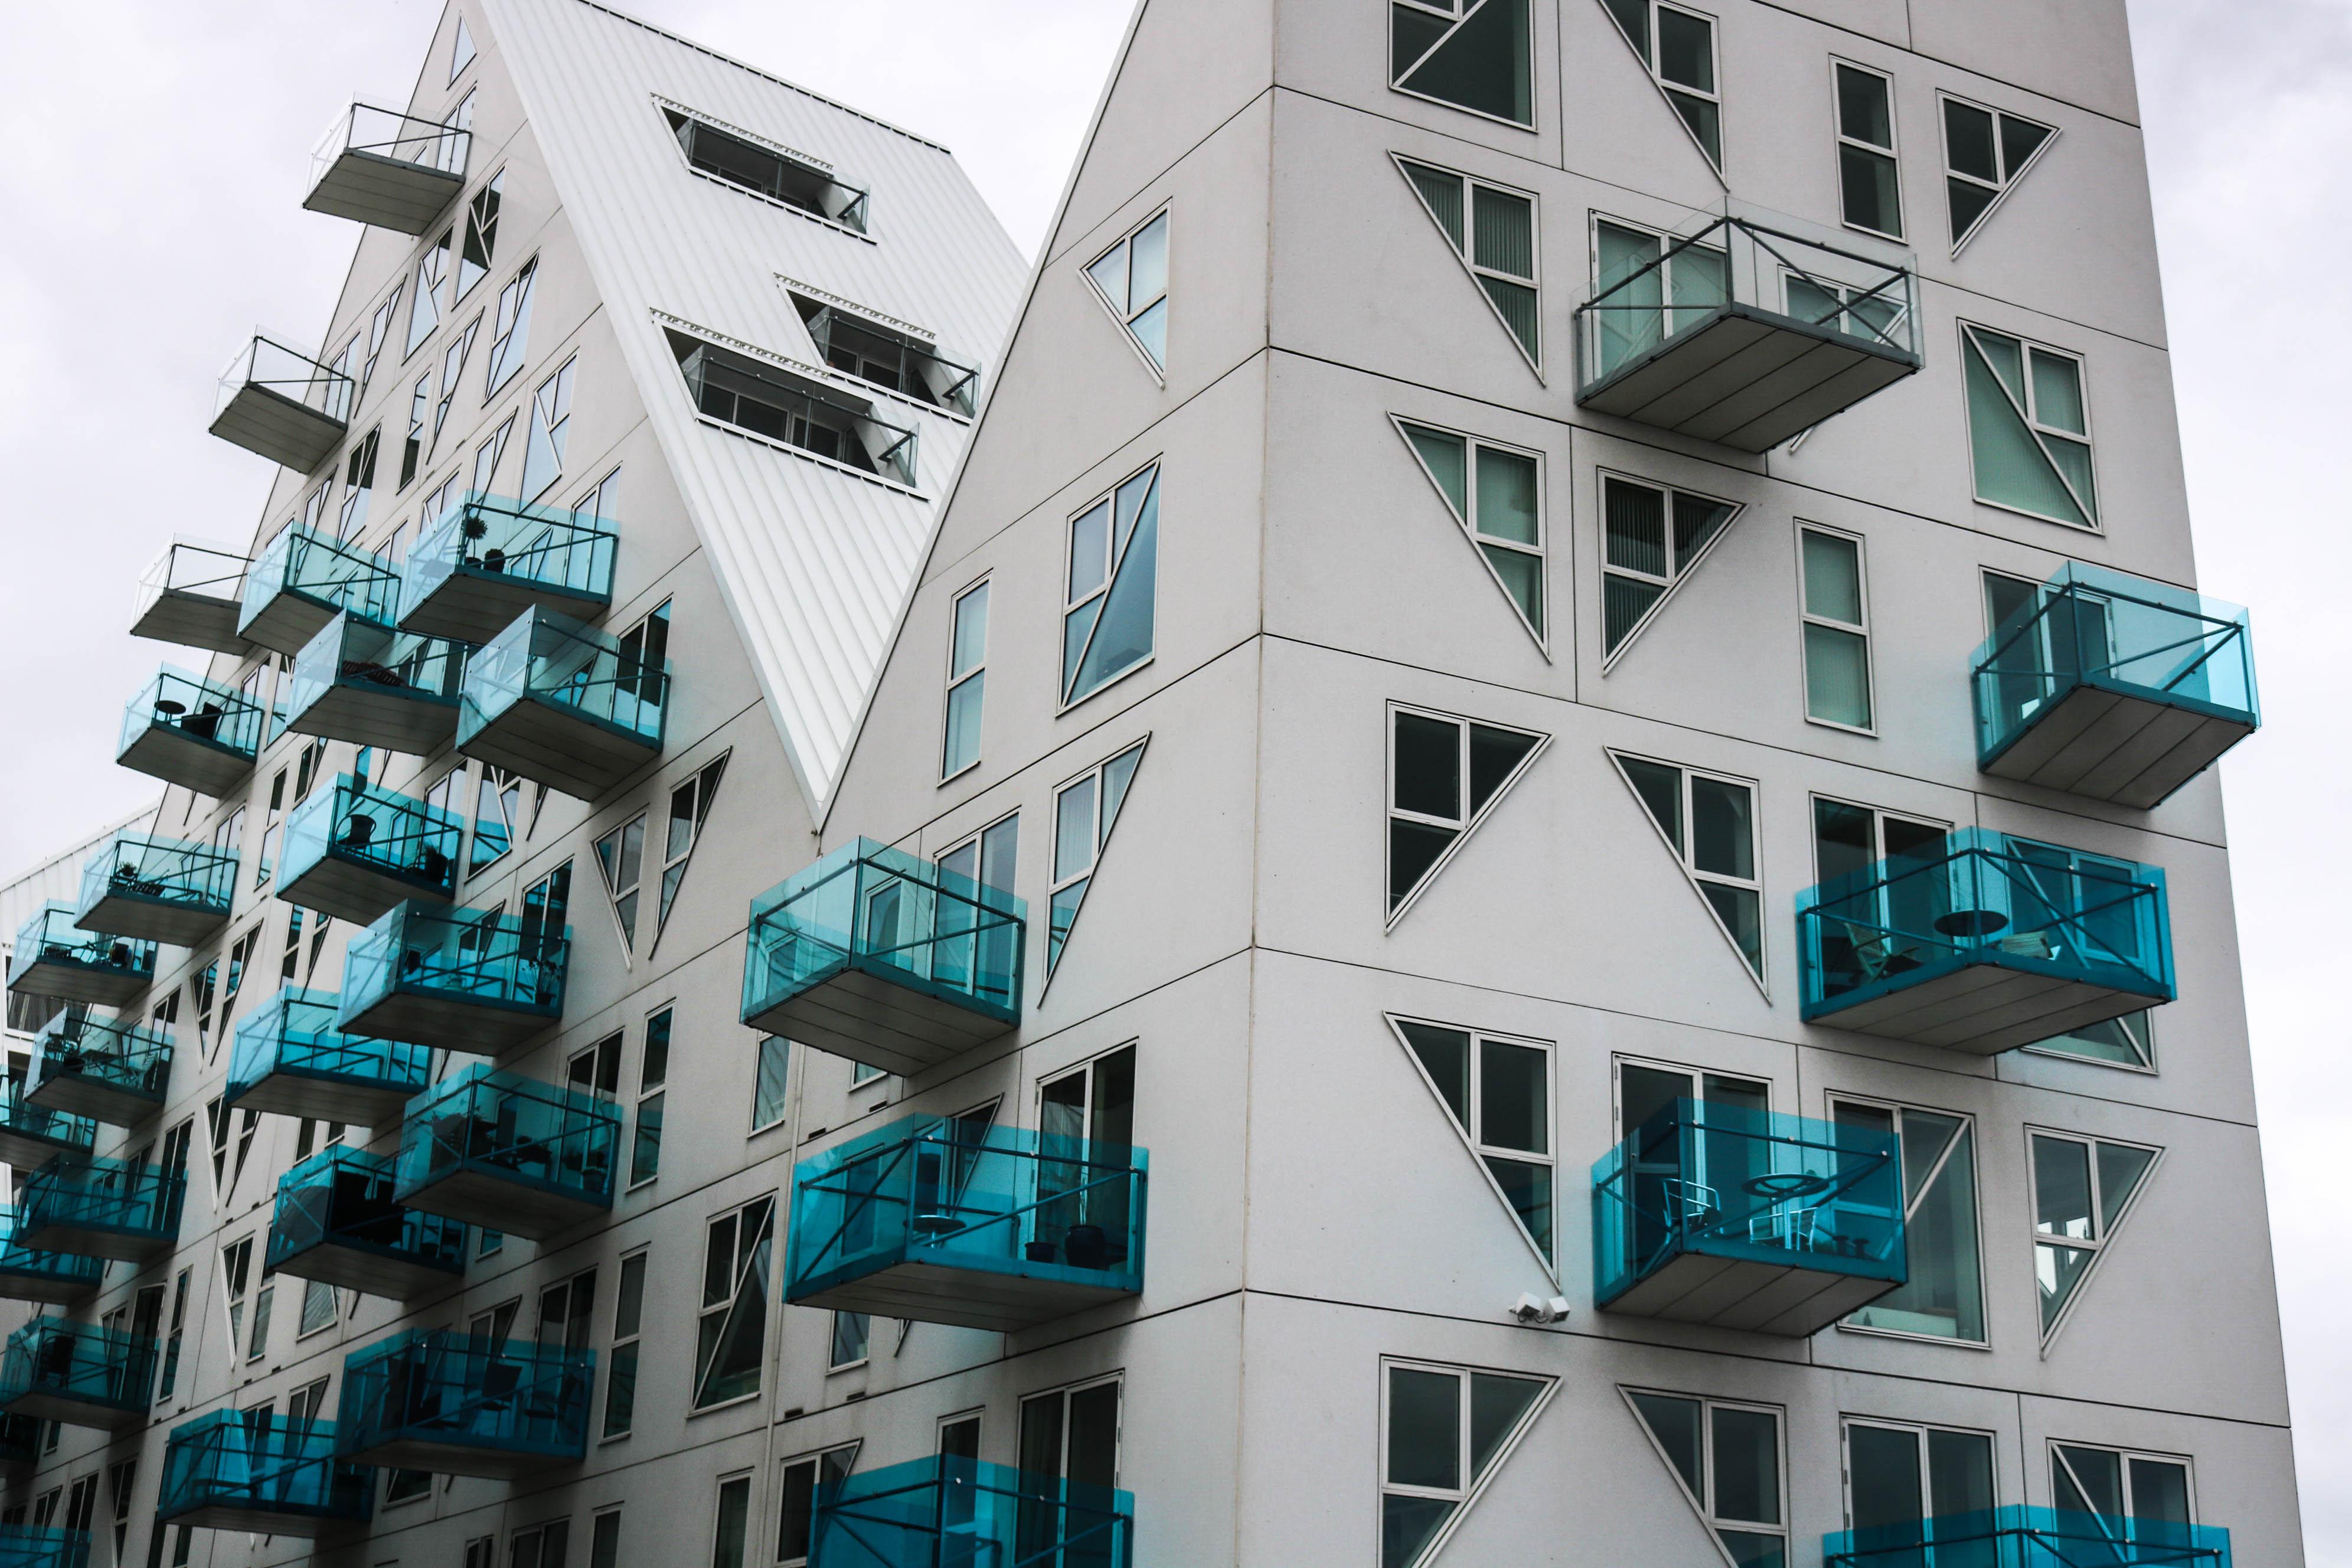 Iceberg 2 1024x683 - Why You Should Visit Aarhus Before 2018